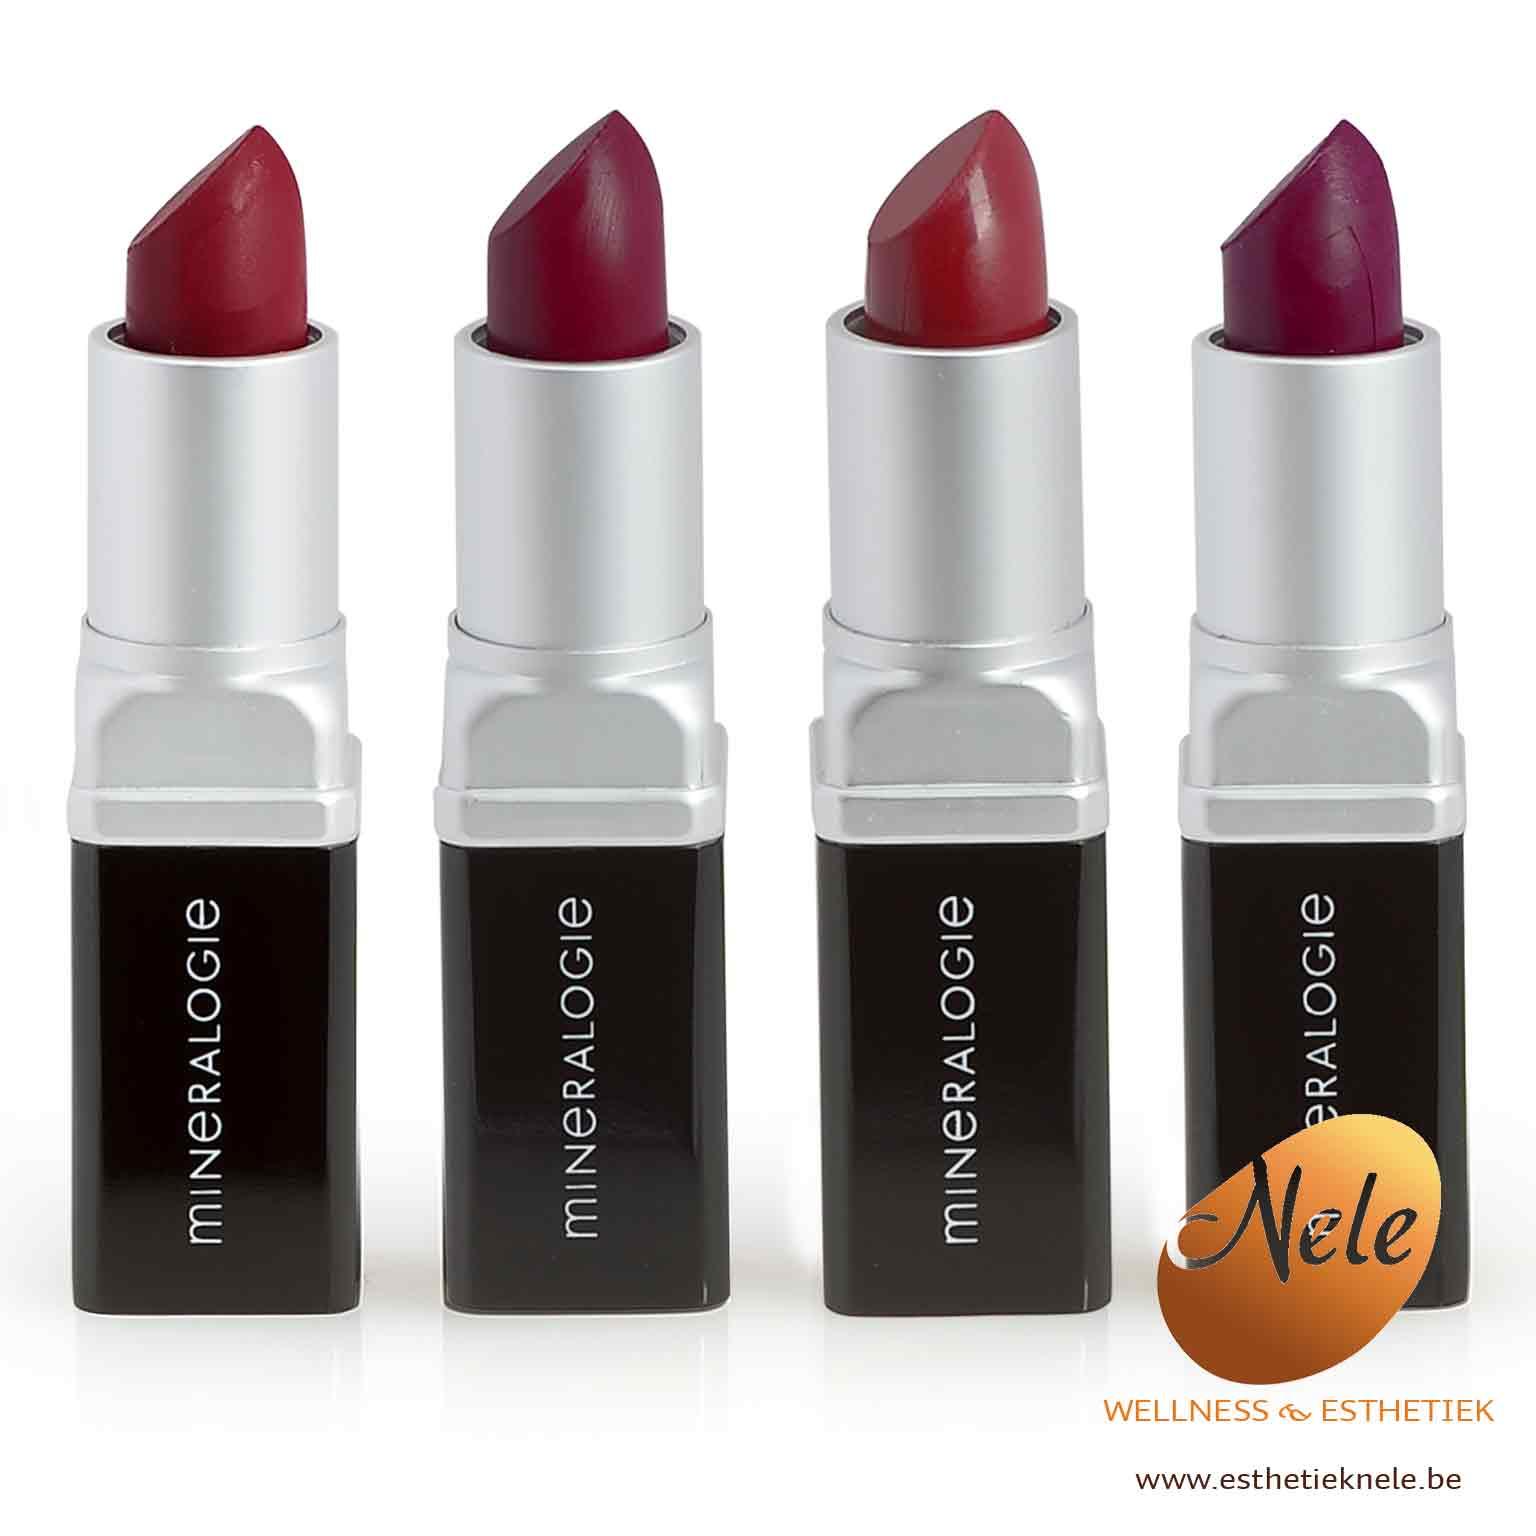 Mineralogie Minerale Make-up Lipstick Wellness Esthetiek Nele